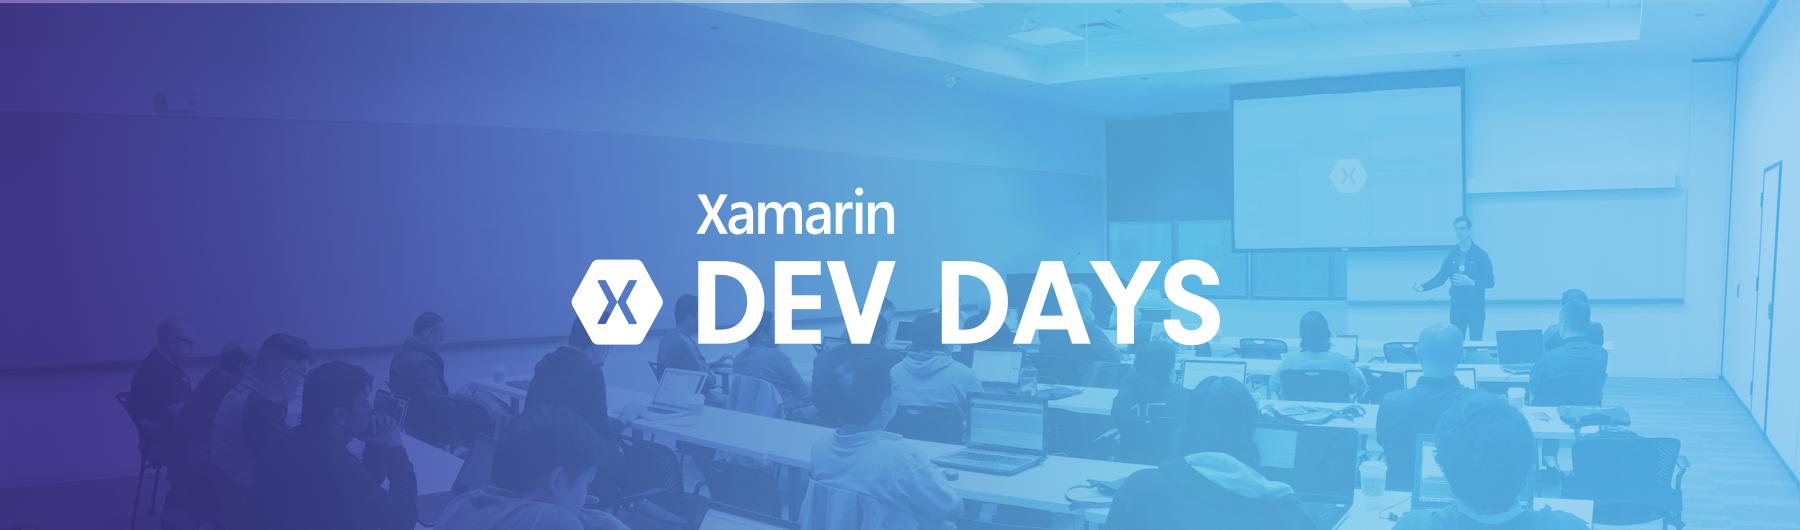 Xamarin Dev Days - Hengelo